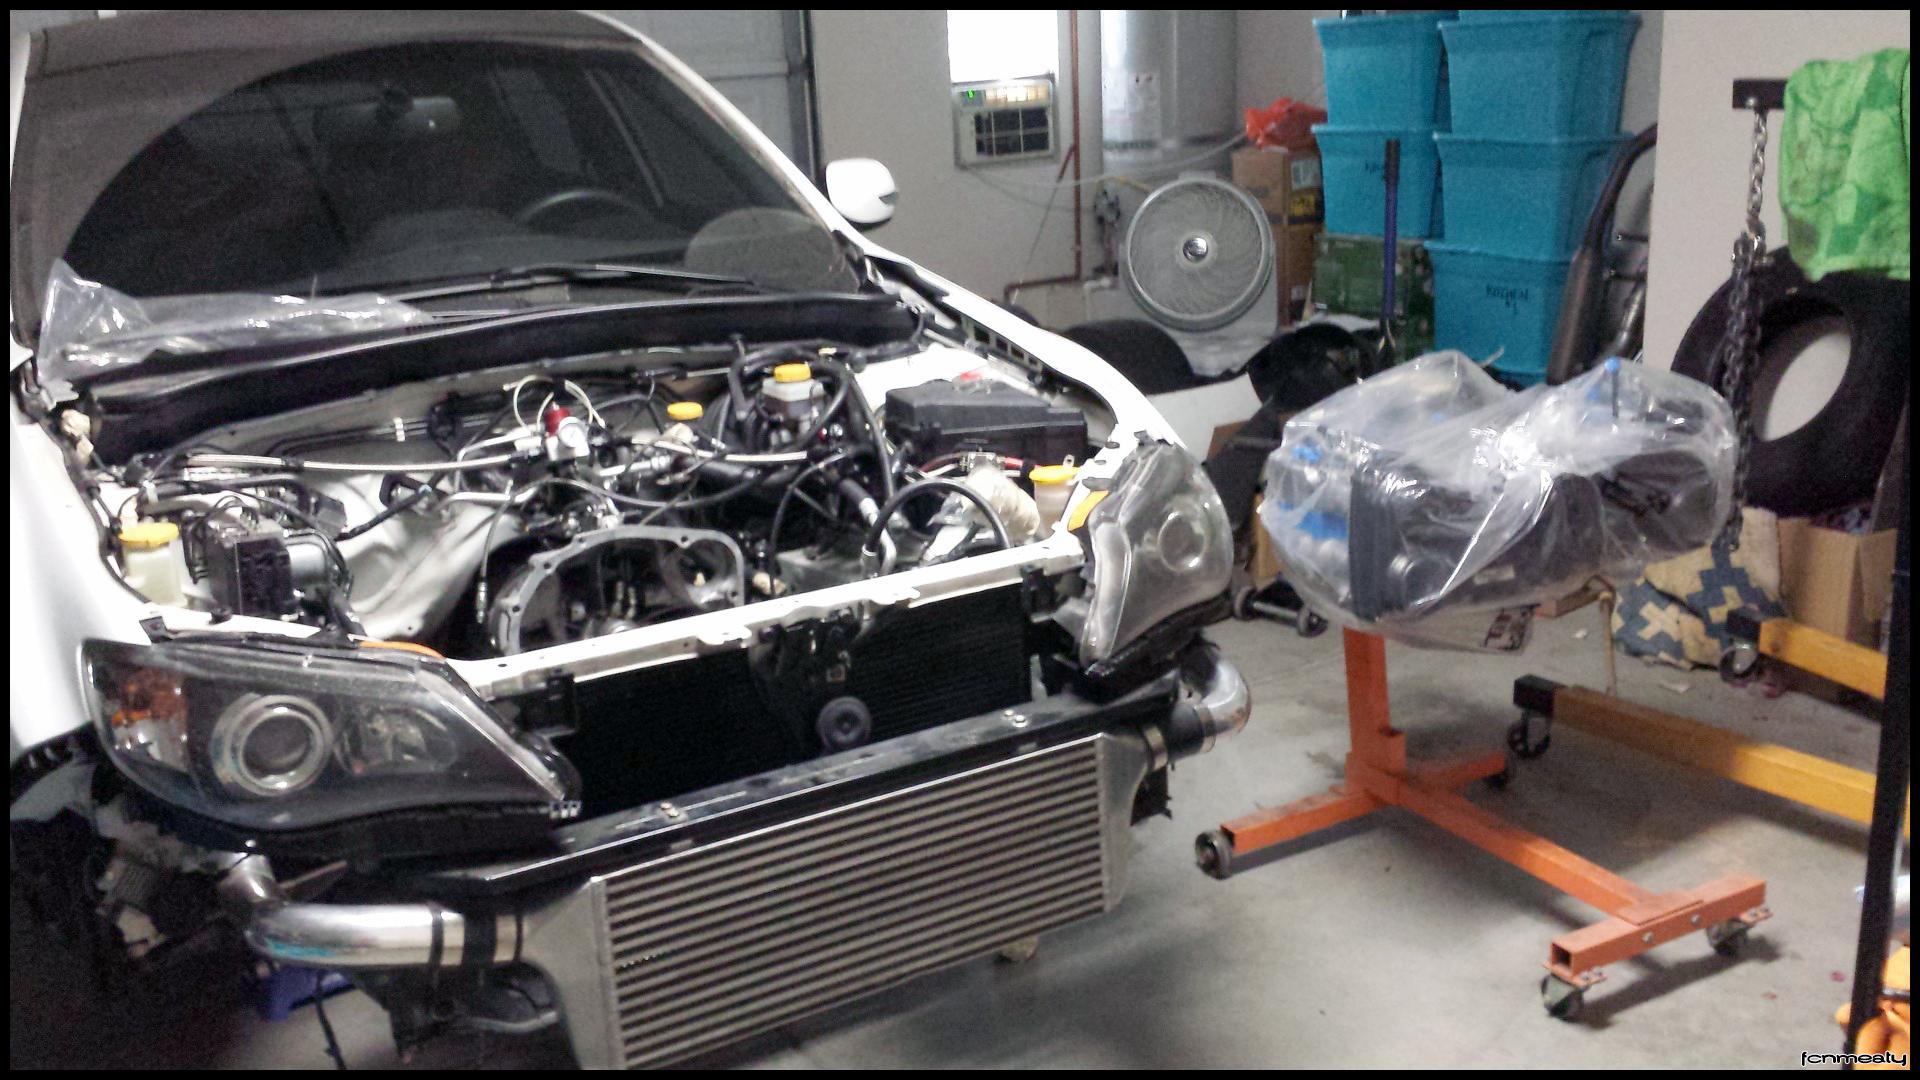 http://i.rideekulo.us/sti/build/phase3/20140712/engine-chassis.jpg